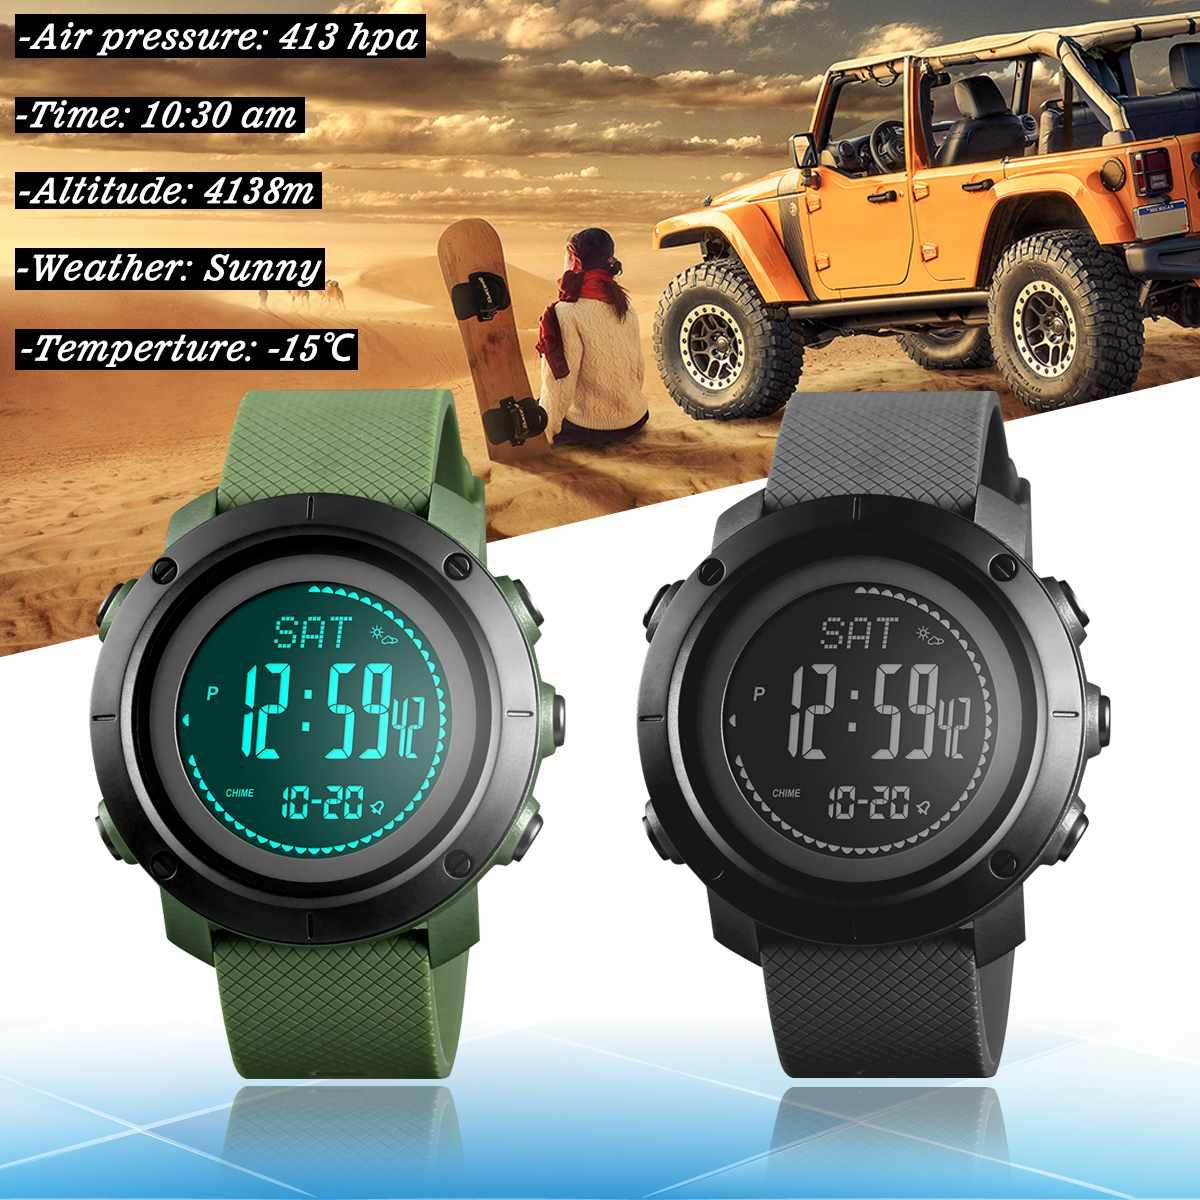 Relojes deportivos Skmei para hombre, reloj Led Digital militar de buceo para hombre, relojes de pulsera electrónicos casuales a la moda, reloj inteligente para hombre